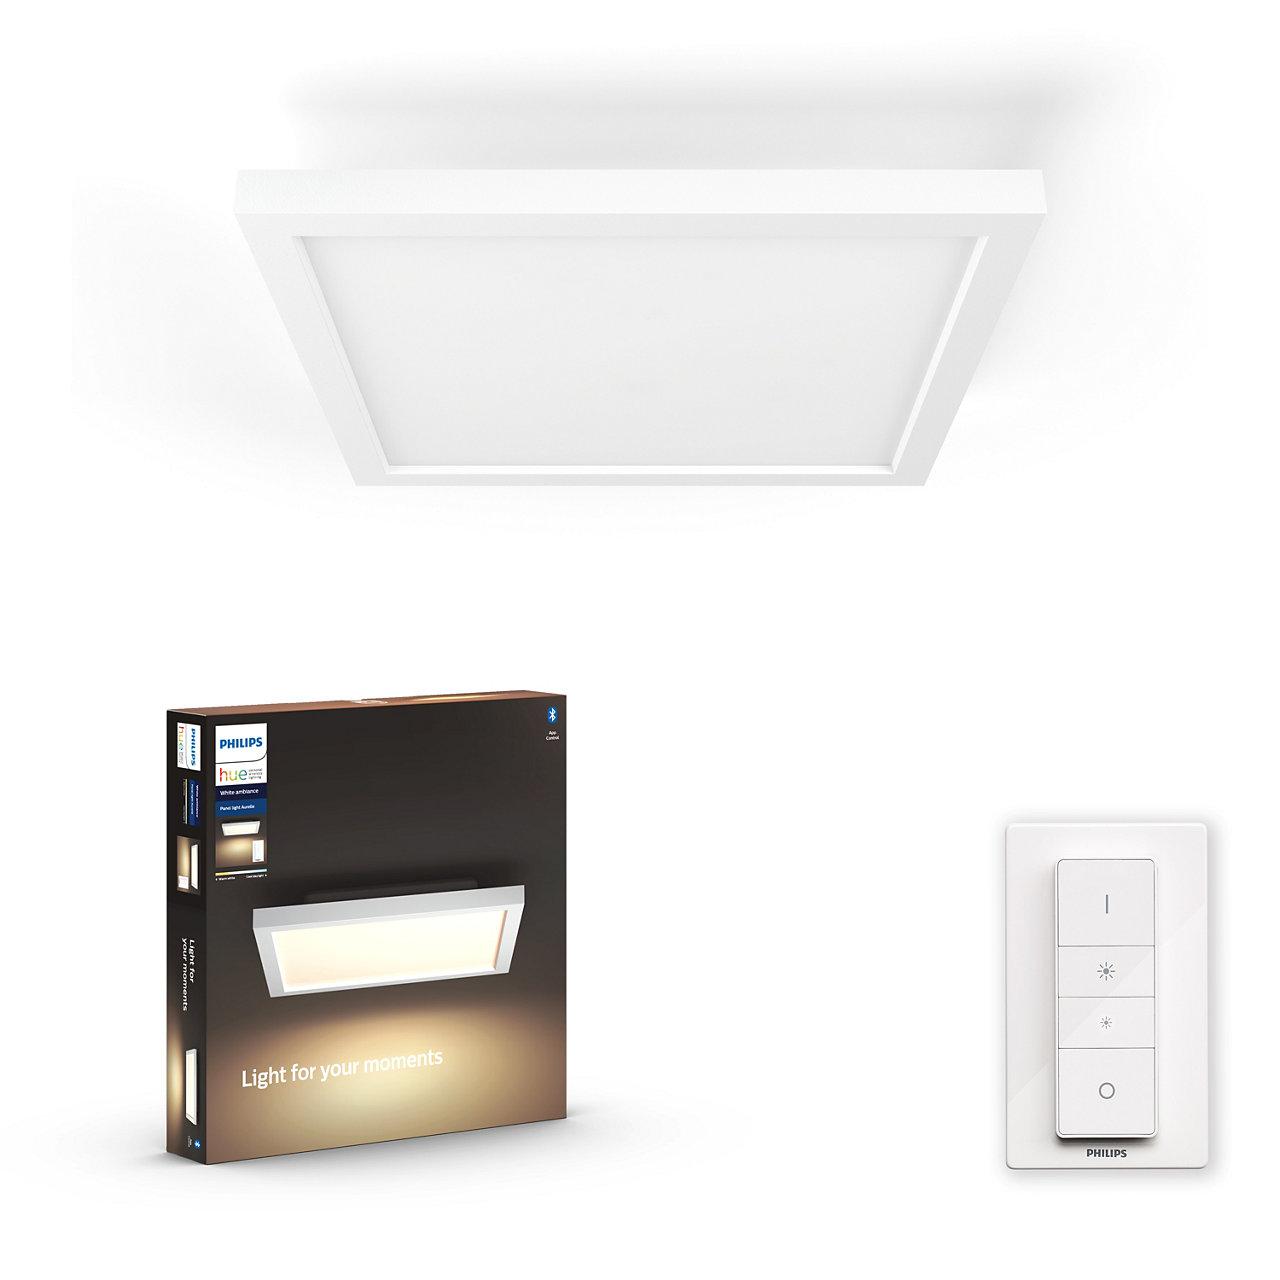 Philips Hue - Aurelle Hue Panel Ceiling Lamp - White Ambiance Bluetooth